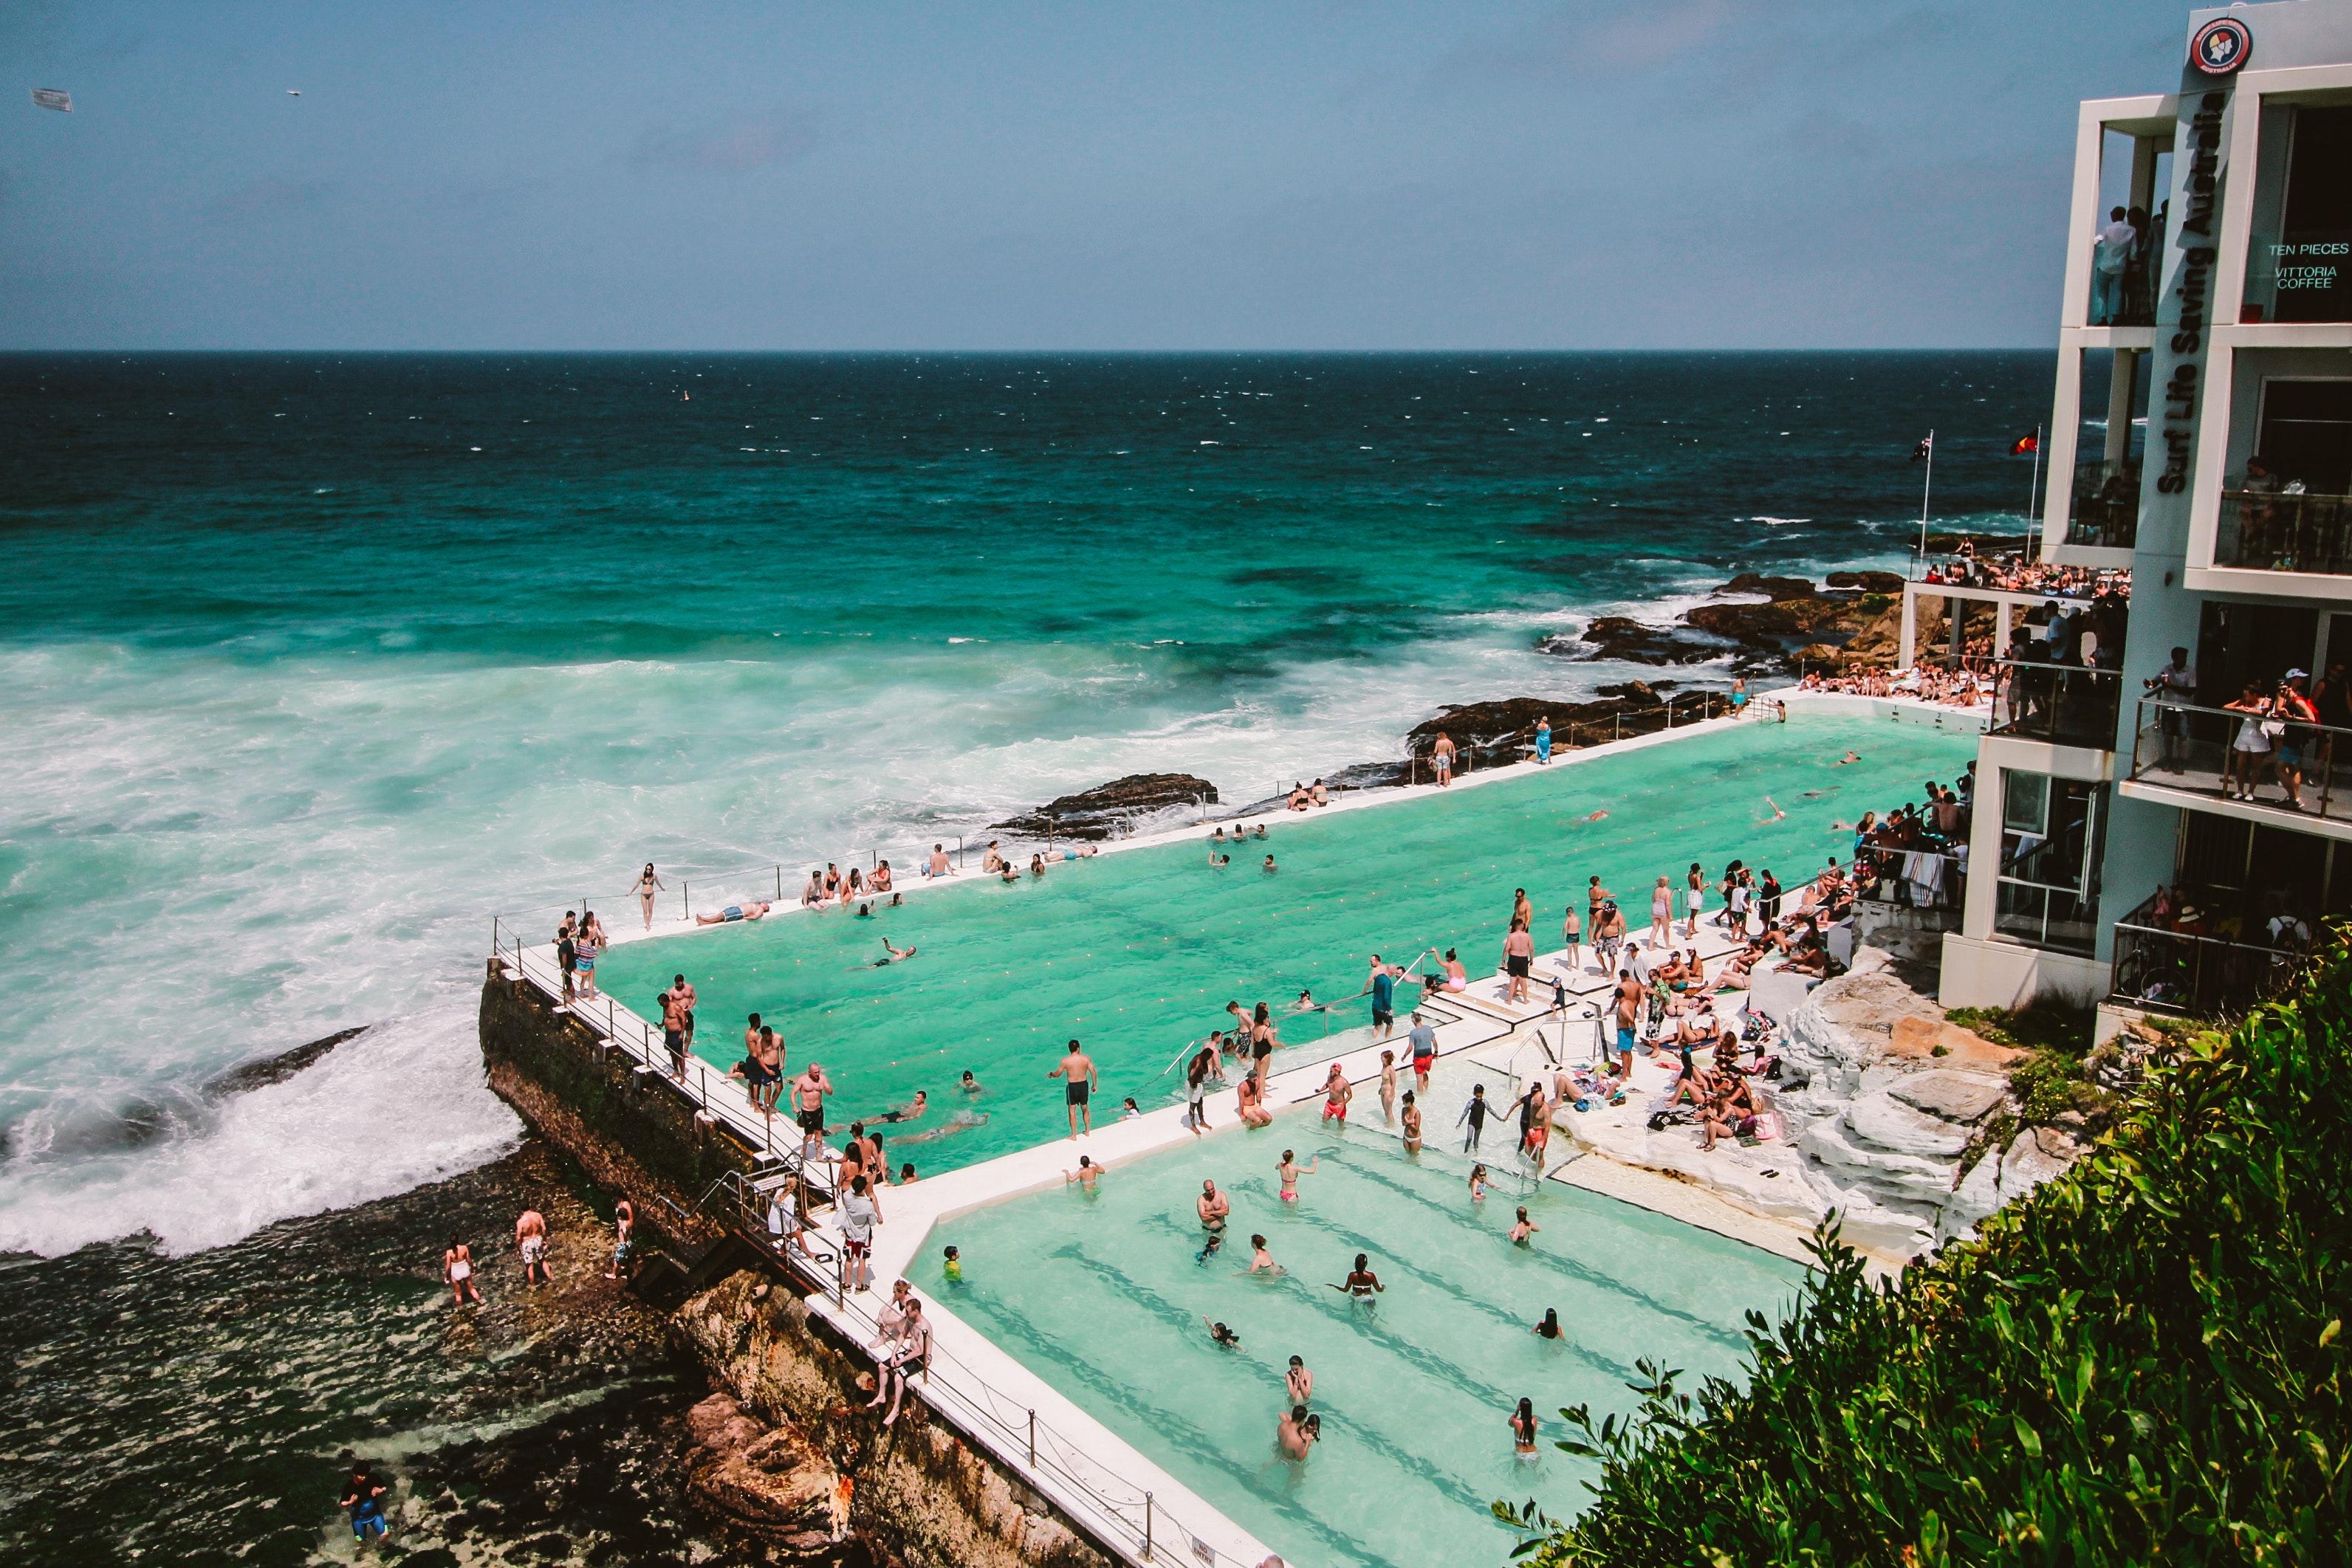 People Gathering Near Swimming Pool, Sea, Resort, Swimming pool, Sydney, HQ Photo